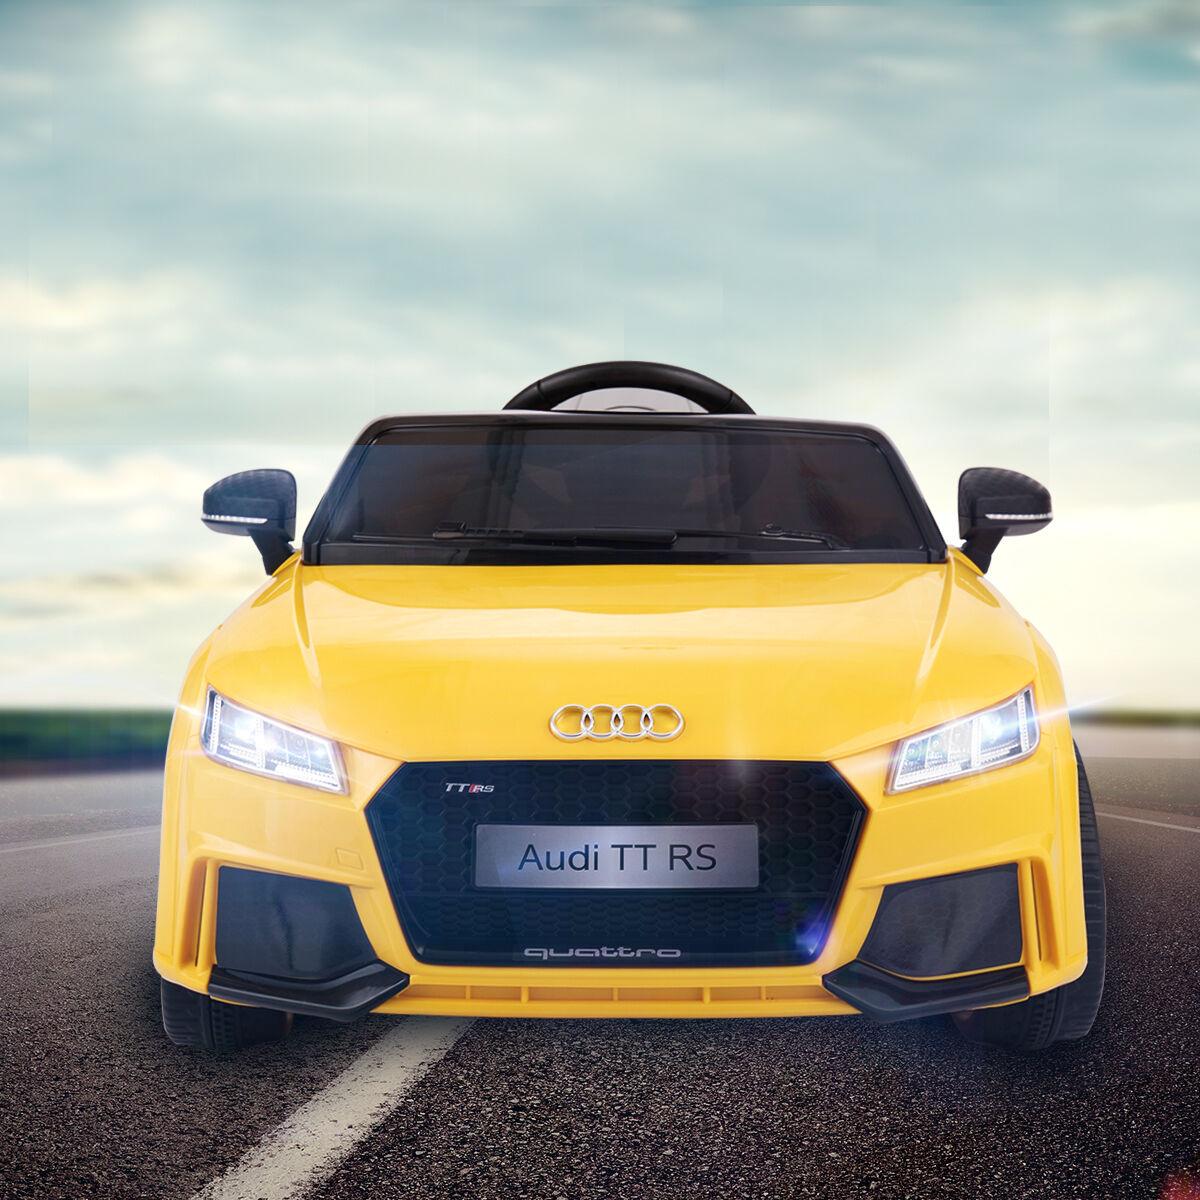 Audi TT RS Electric Kids Ride Cars MP3 LED Lights Remote Power Wheels 12 Volt